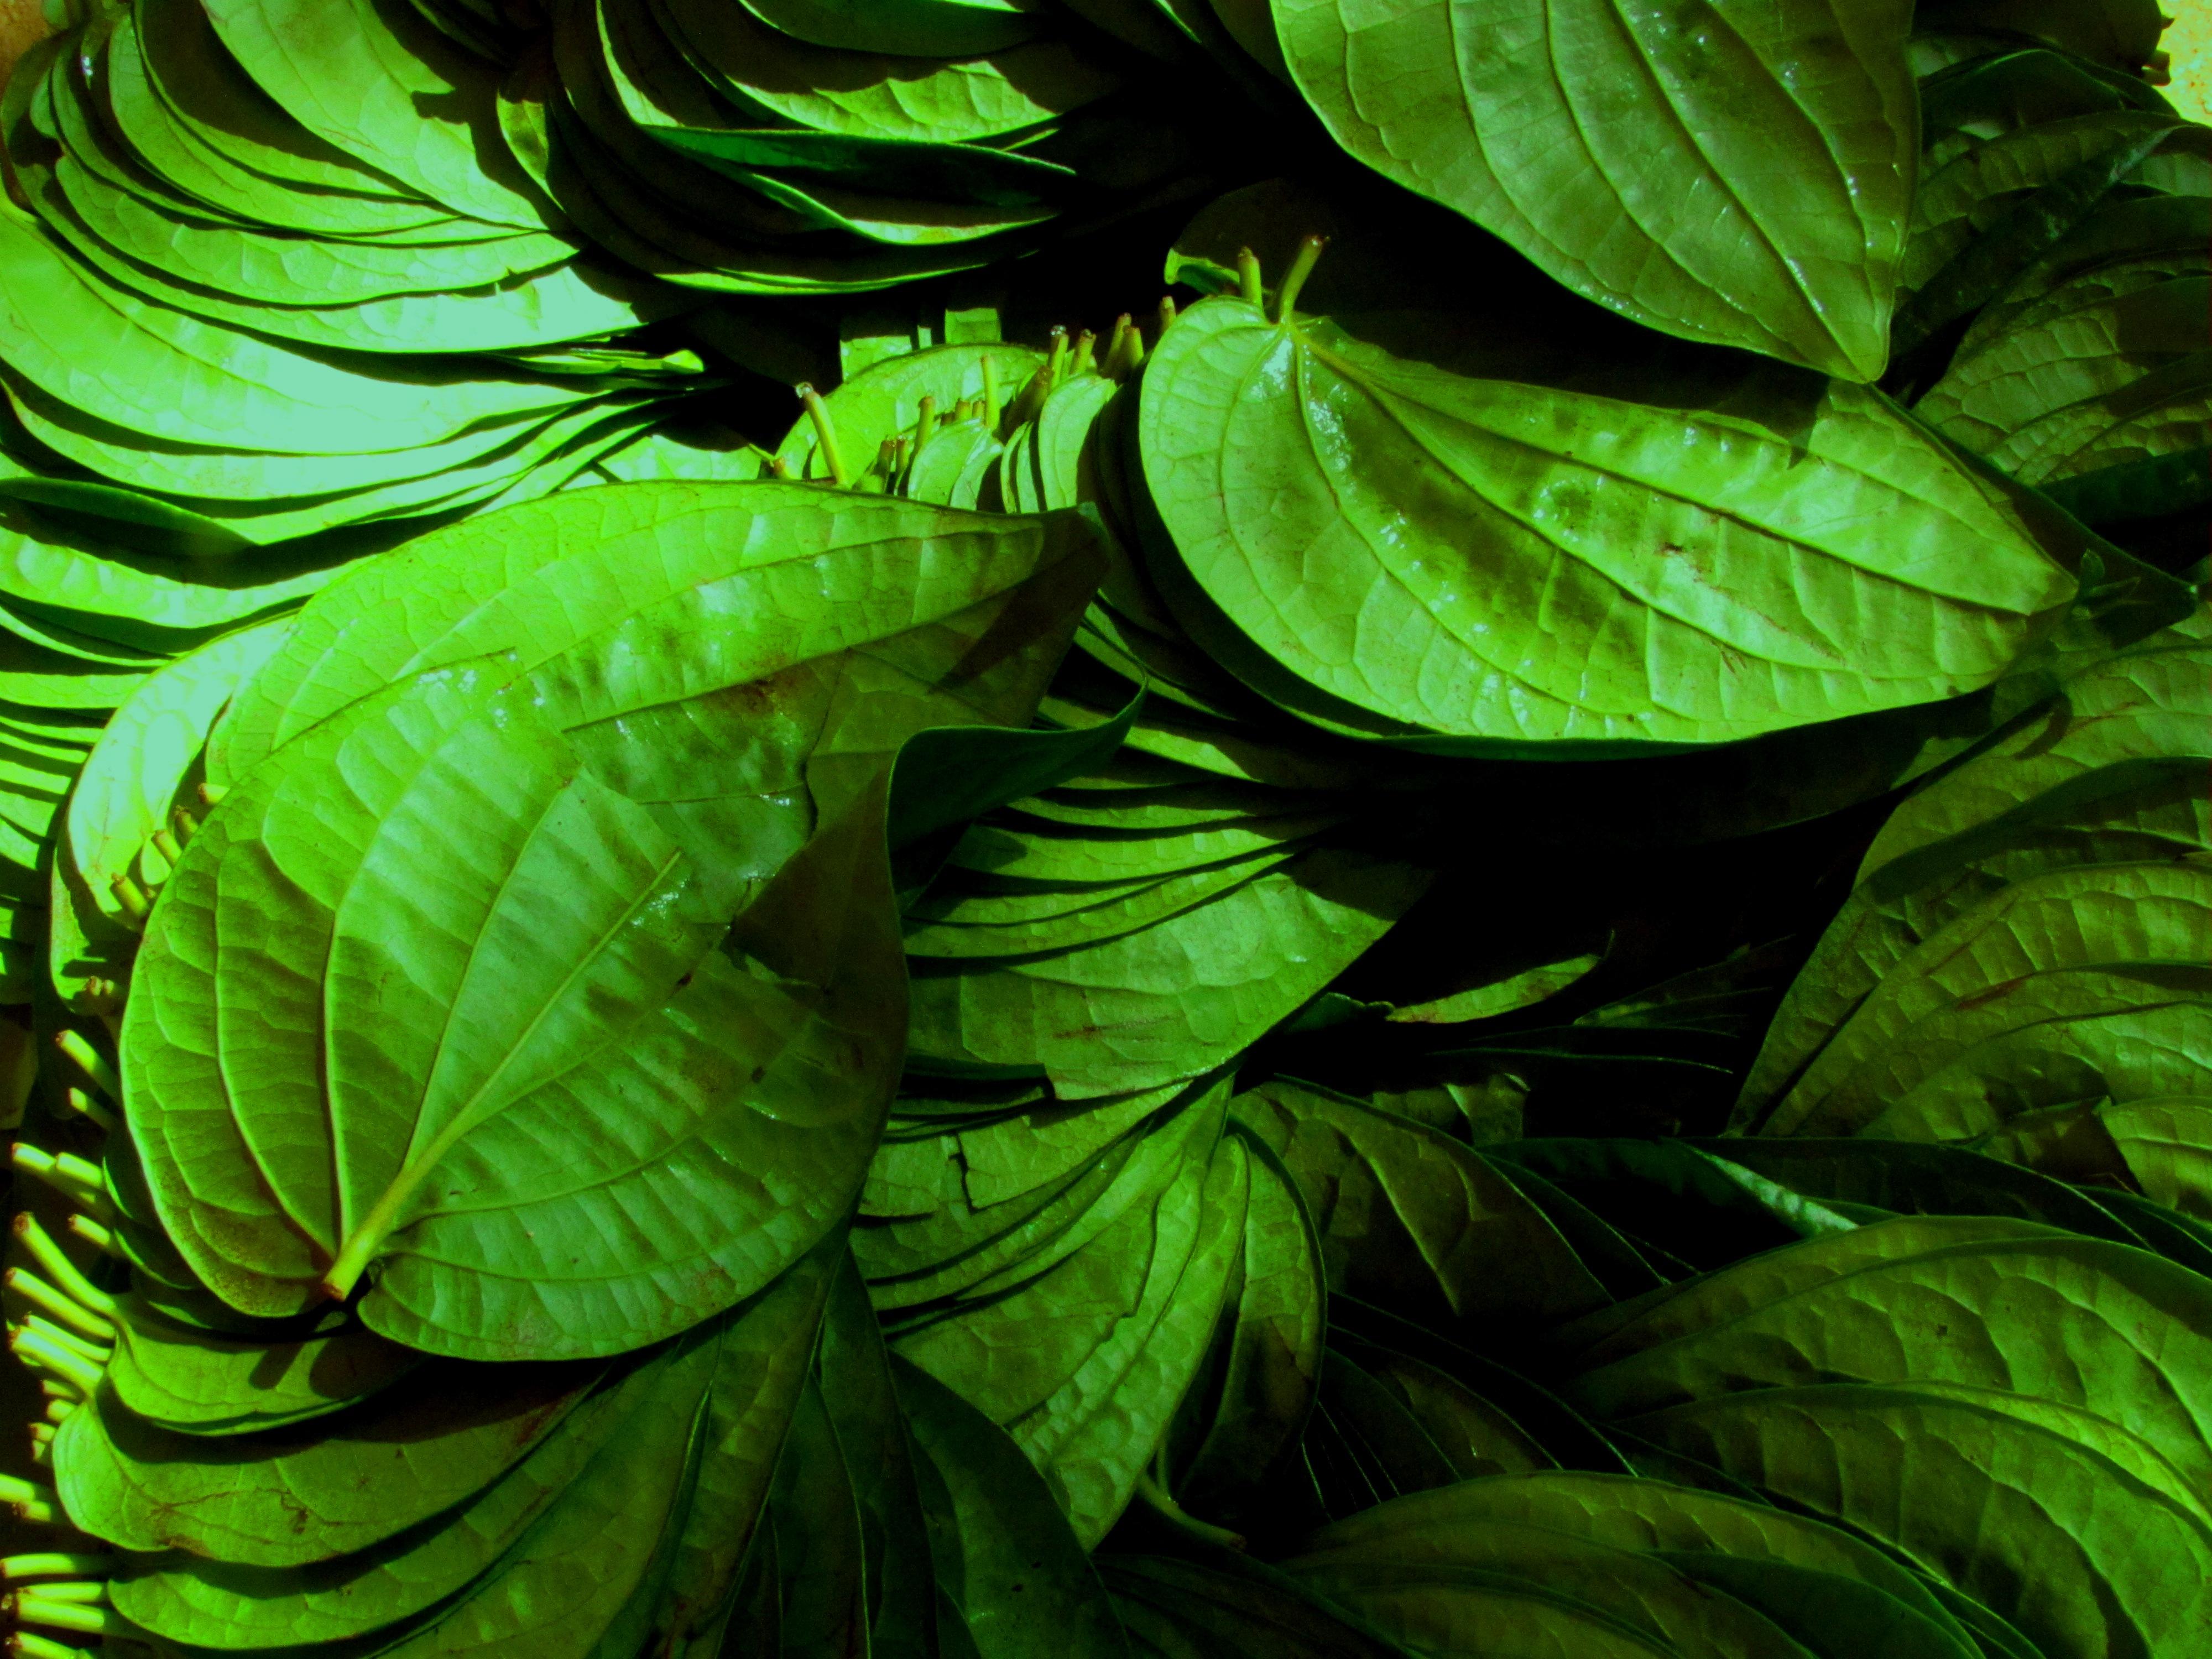 Mysore betel leaf - Wikipedia